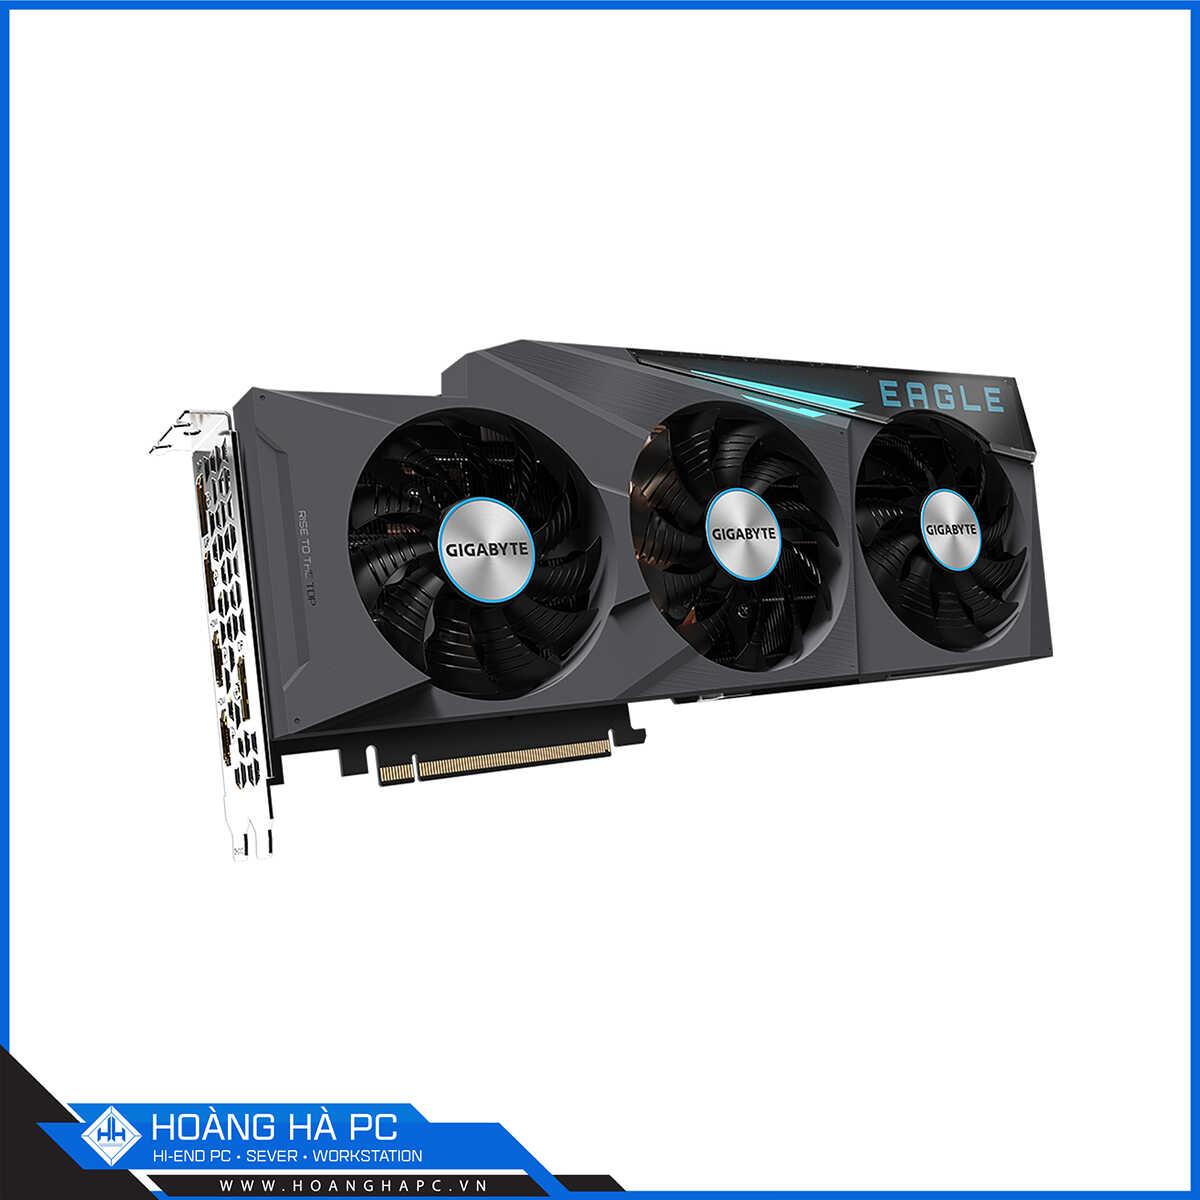 GIGABYTE GeForce RTX 3080 EAGLE OC 10G